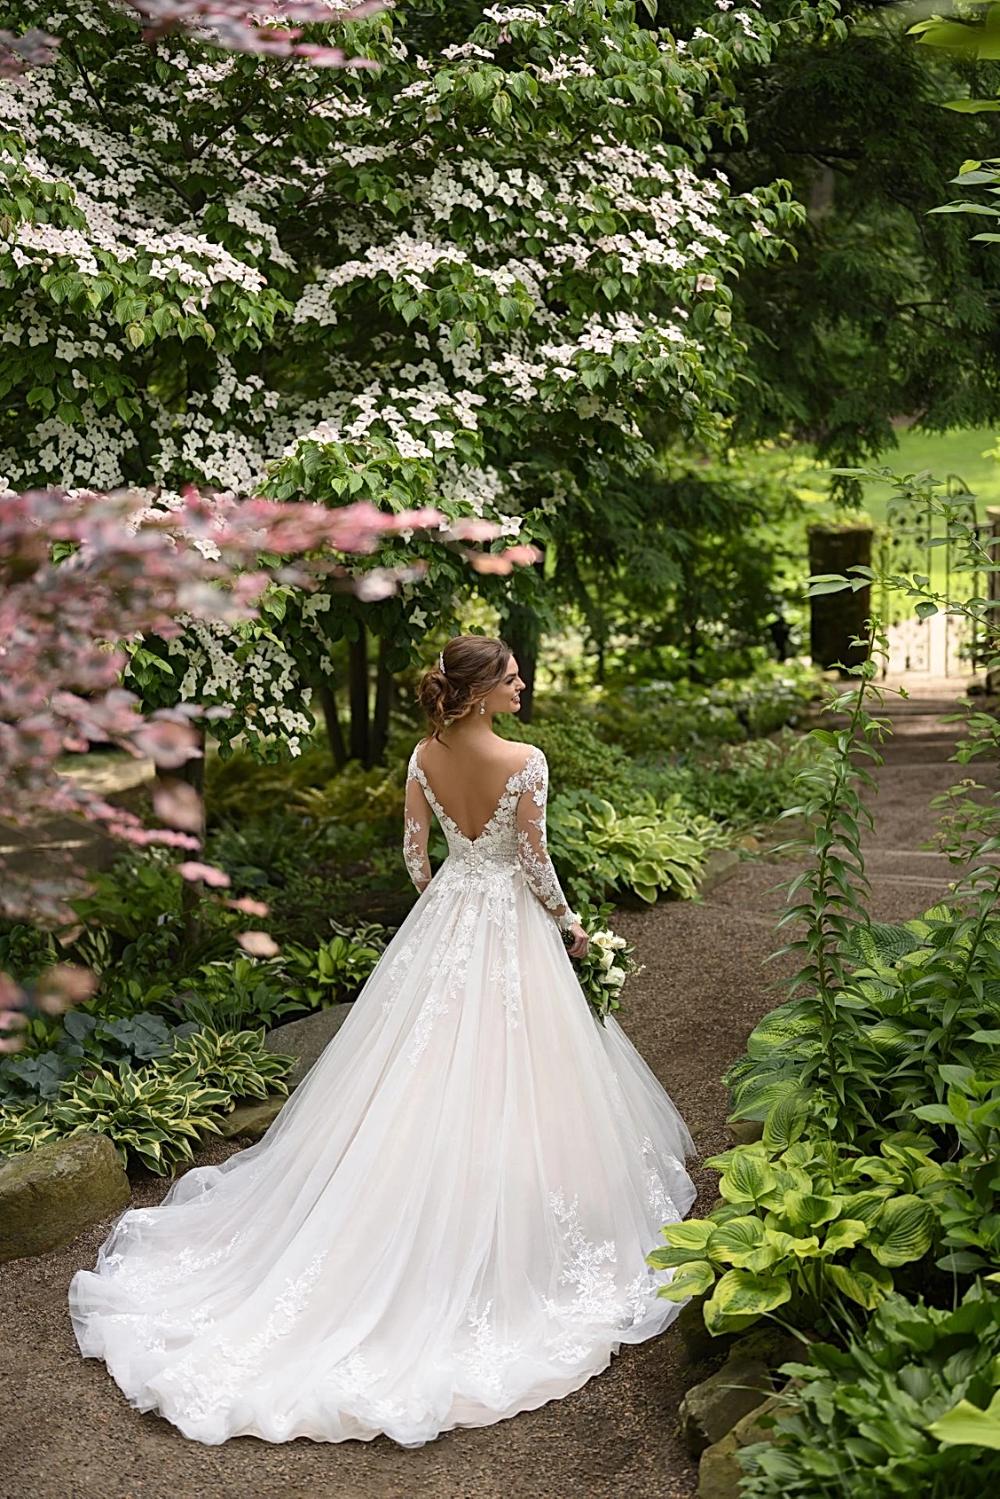 Plus Size Wedding Dresses Dallas Tx Circle Park Bridal Vintageweddingdresses Ali In 2020 Wedding Dresses Dallas Wedding Dresses Wedding Dress Long Sleeve